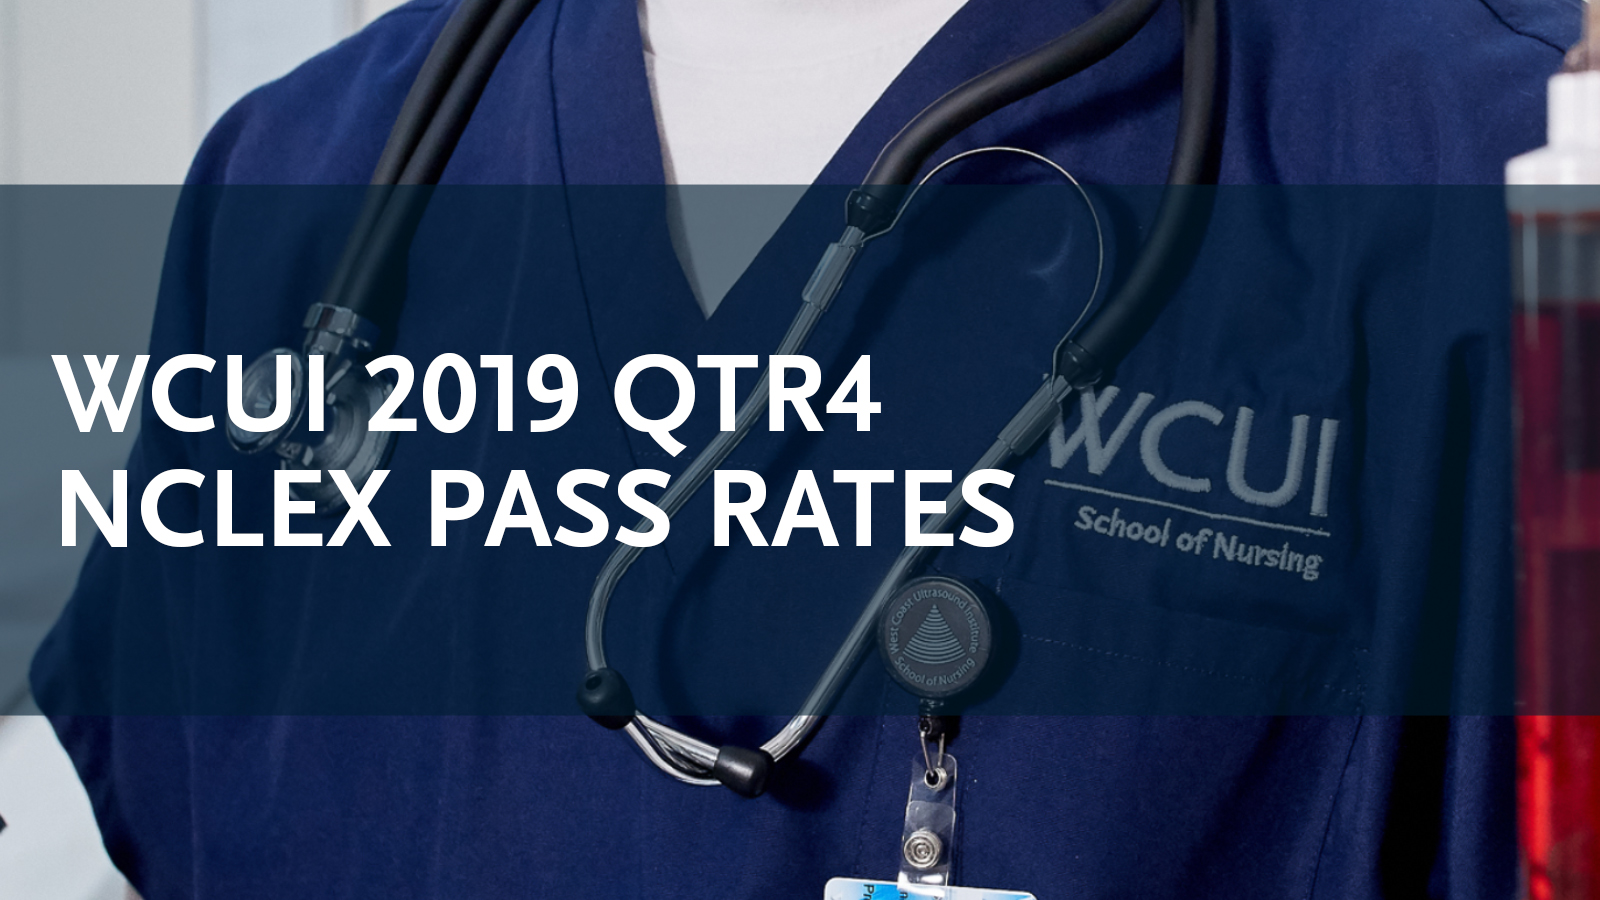 WCUI 2019 QTR4 Pass Rates